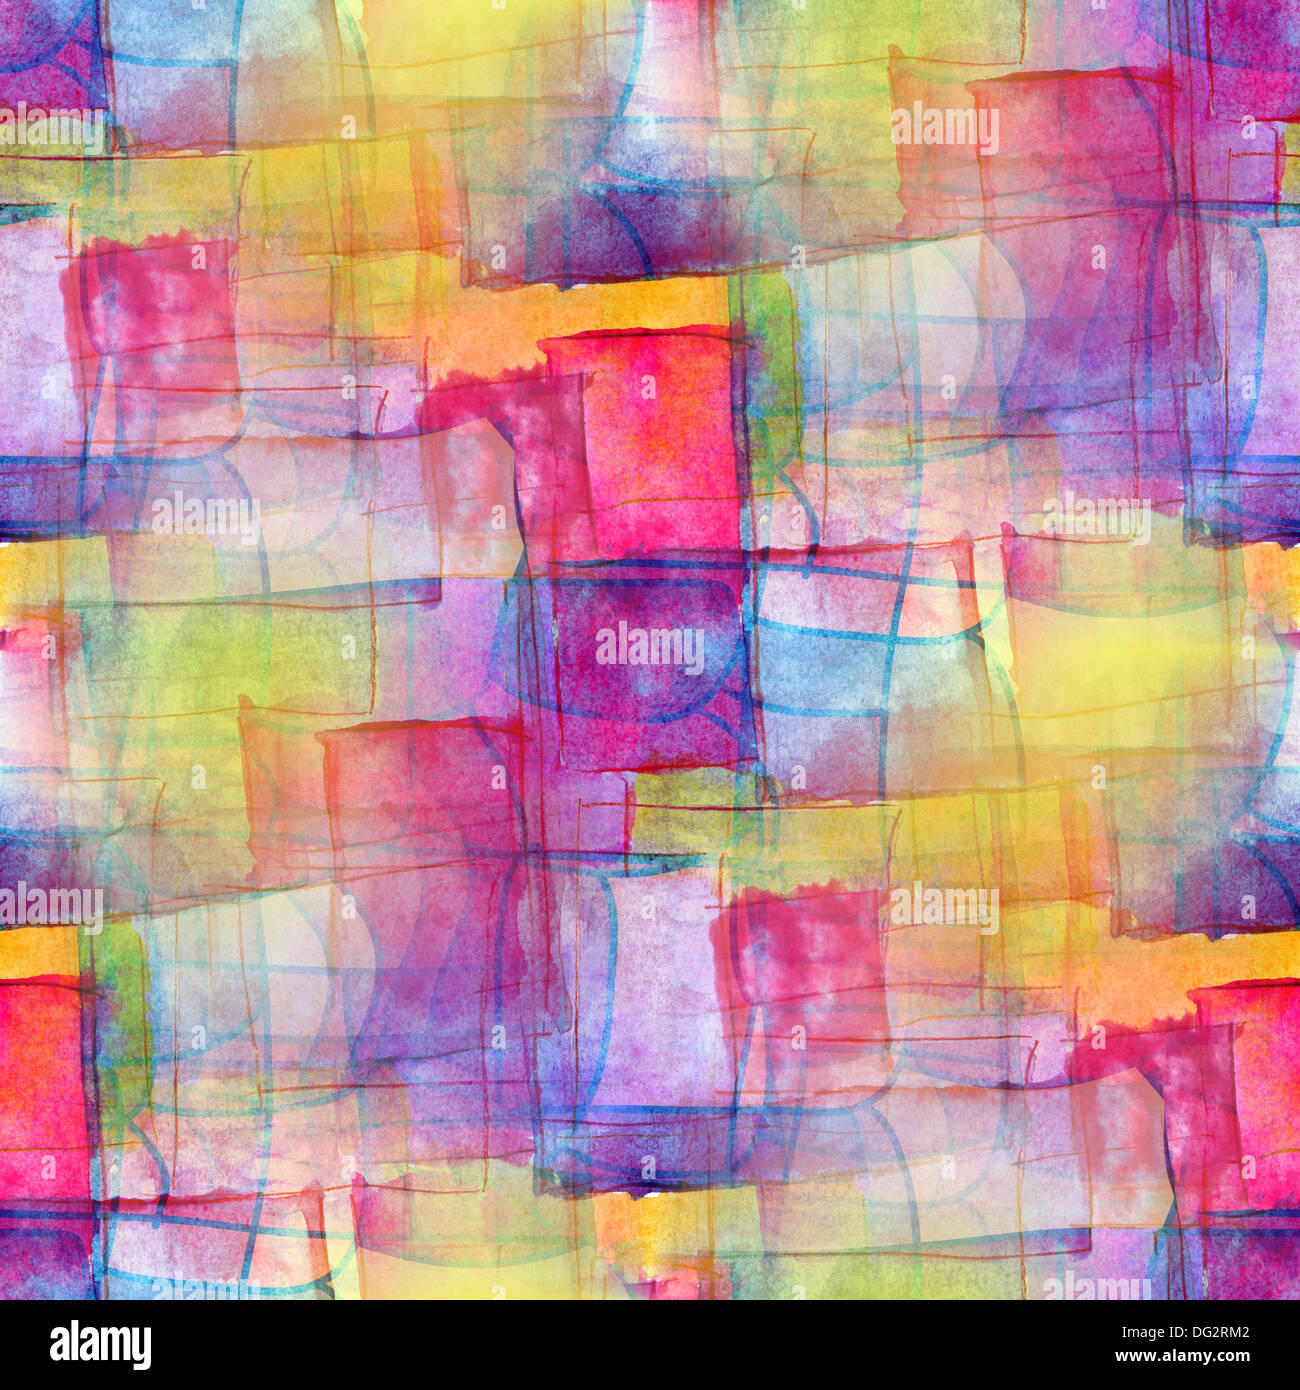 Artist Seamless Blue Cubism Abstract Art Texture Watercolor